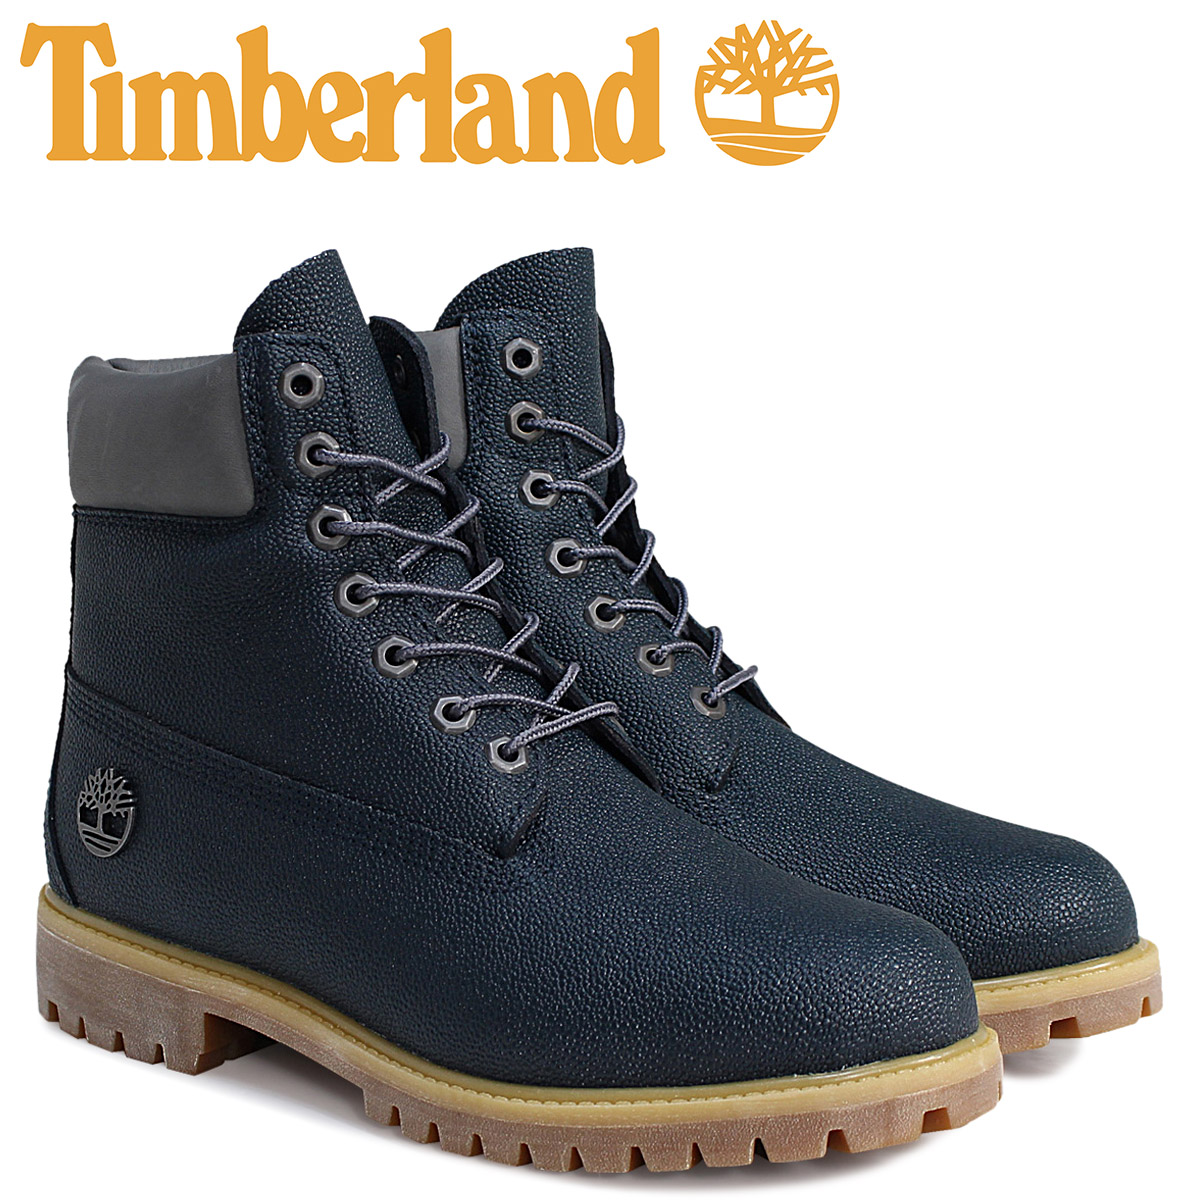 9027e170806b2 Timberland timberland 6 inches premium boots men 6INCHI 6-INCH PREMIUM  WATERPLOOF BOOTS A181J W ...